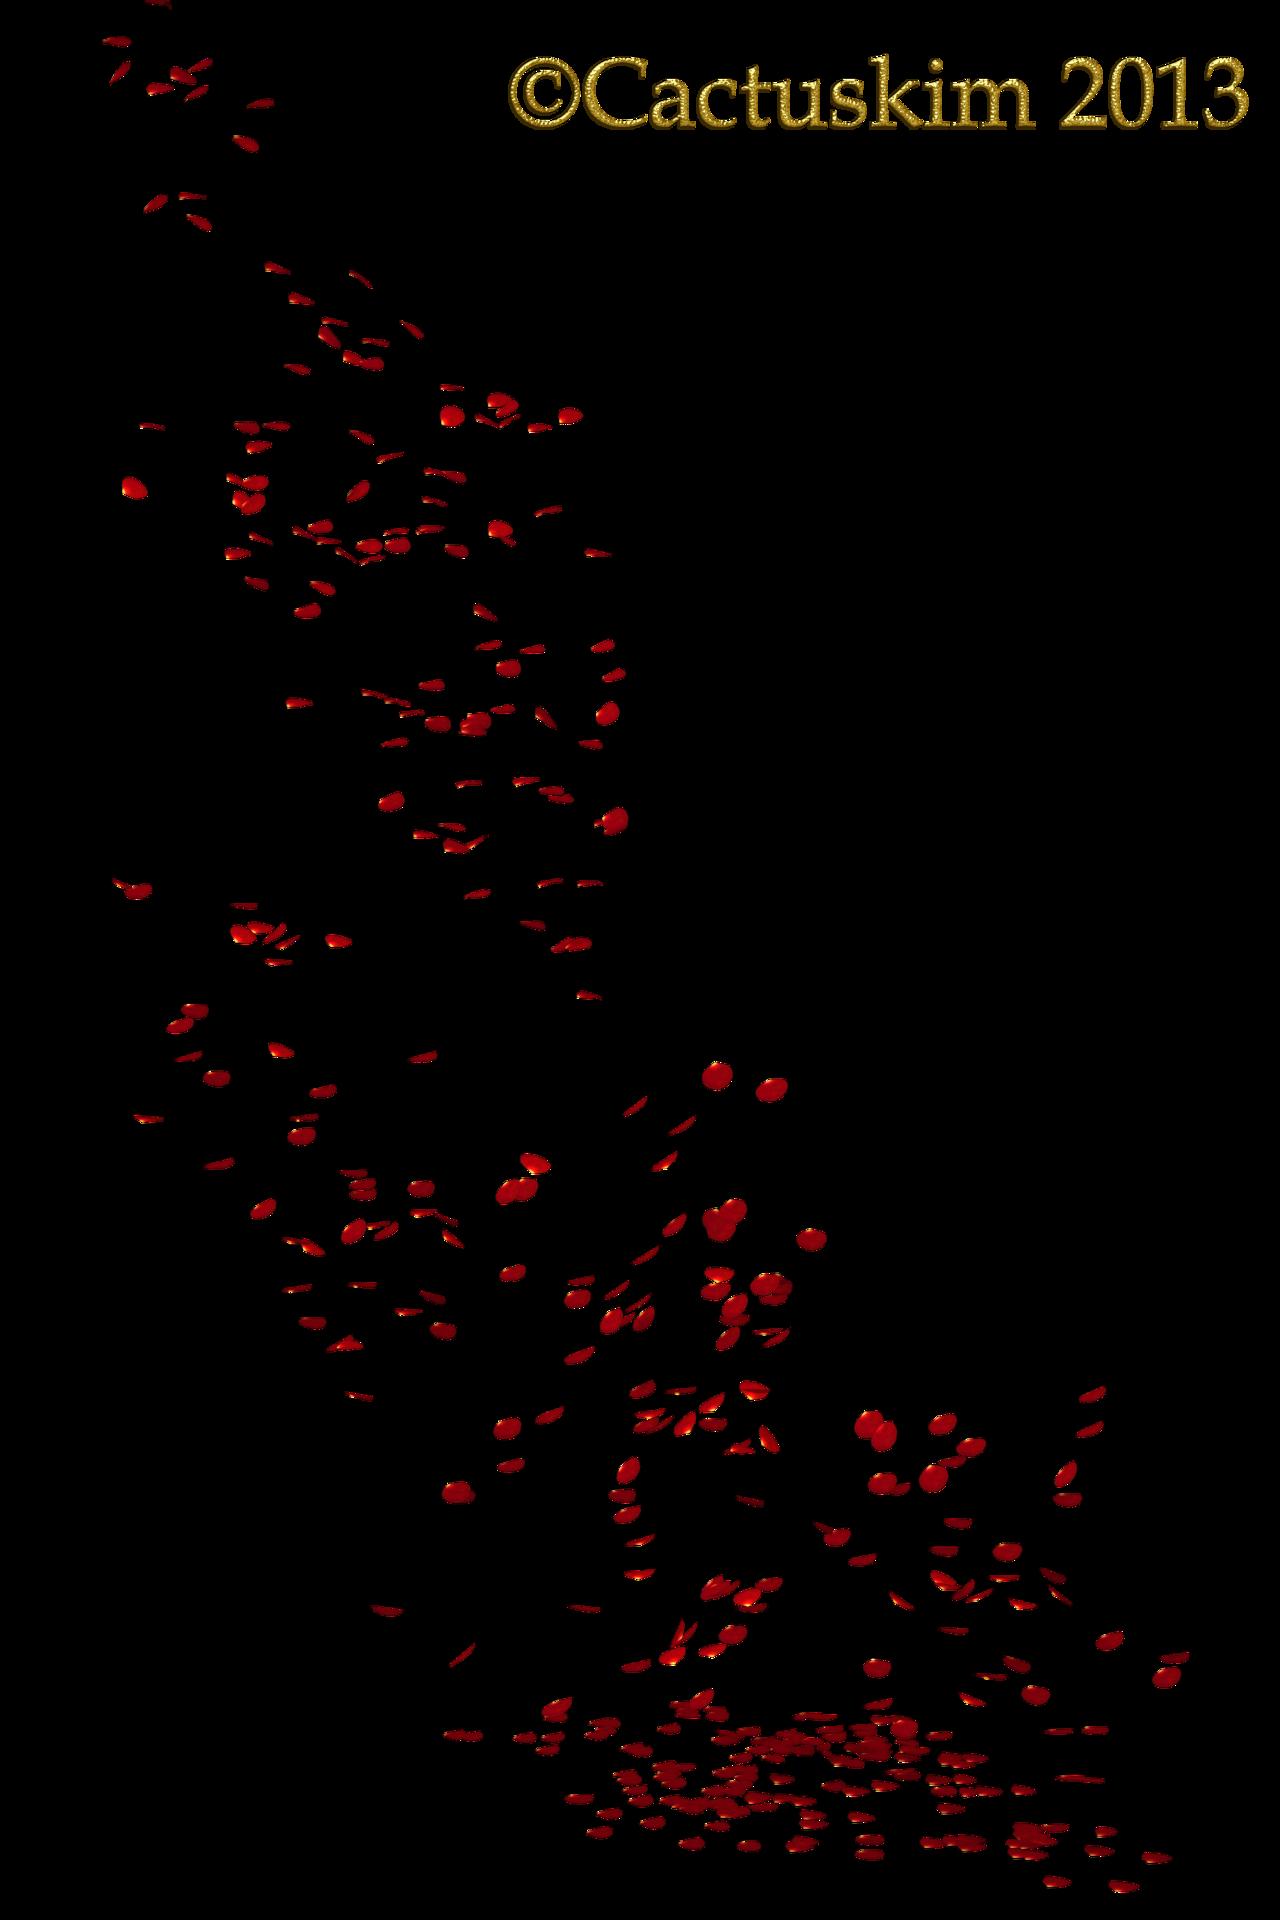 Png fall flowers transparent. Flower petals falling clipart